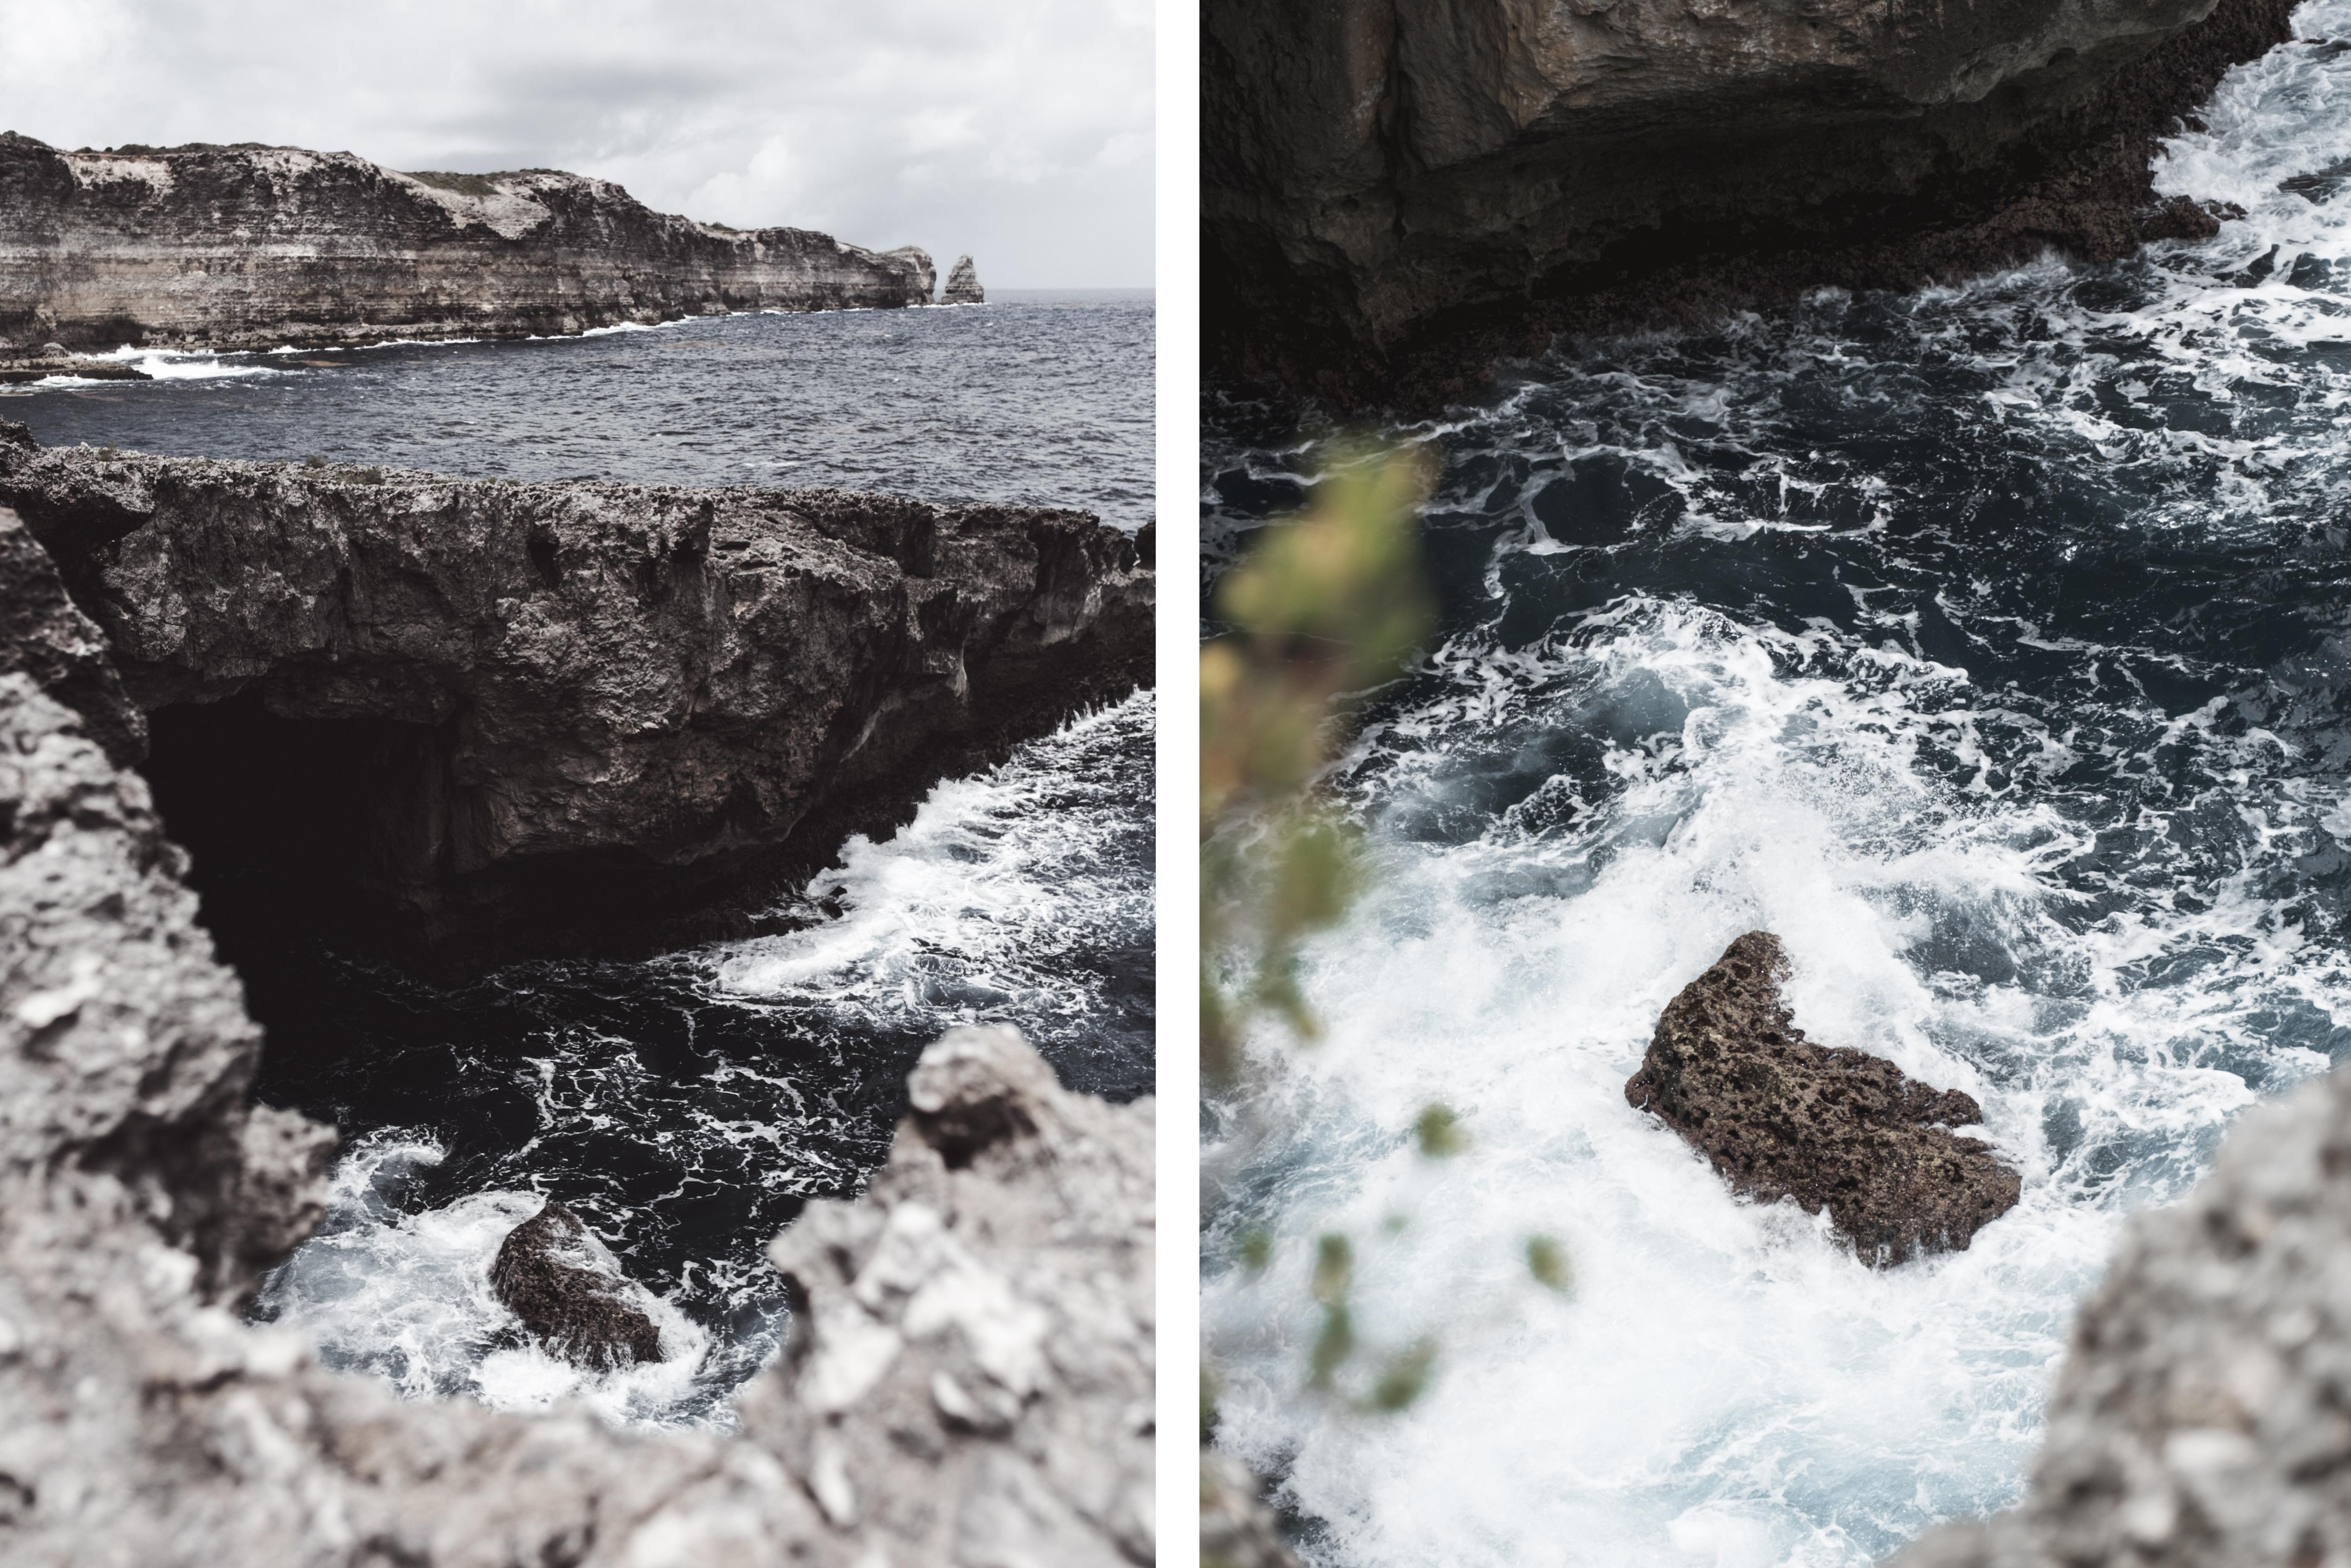 Guadeloupe-Trou-Man-Coco